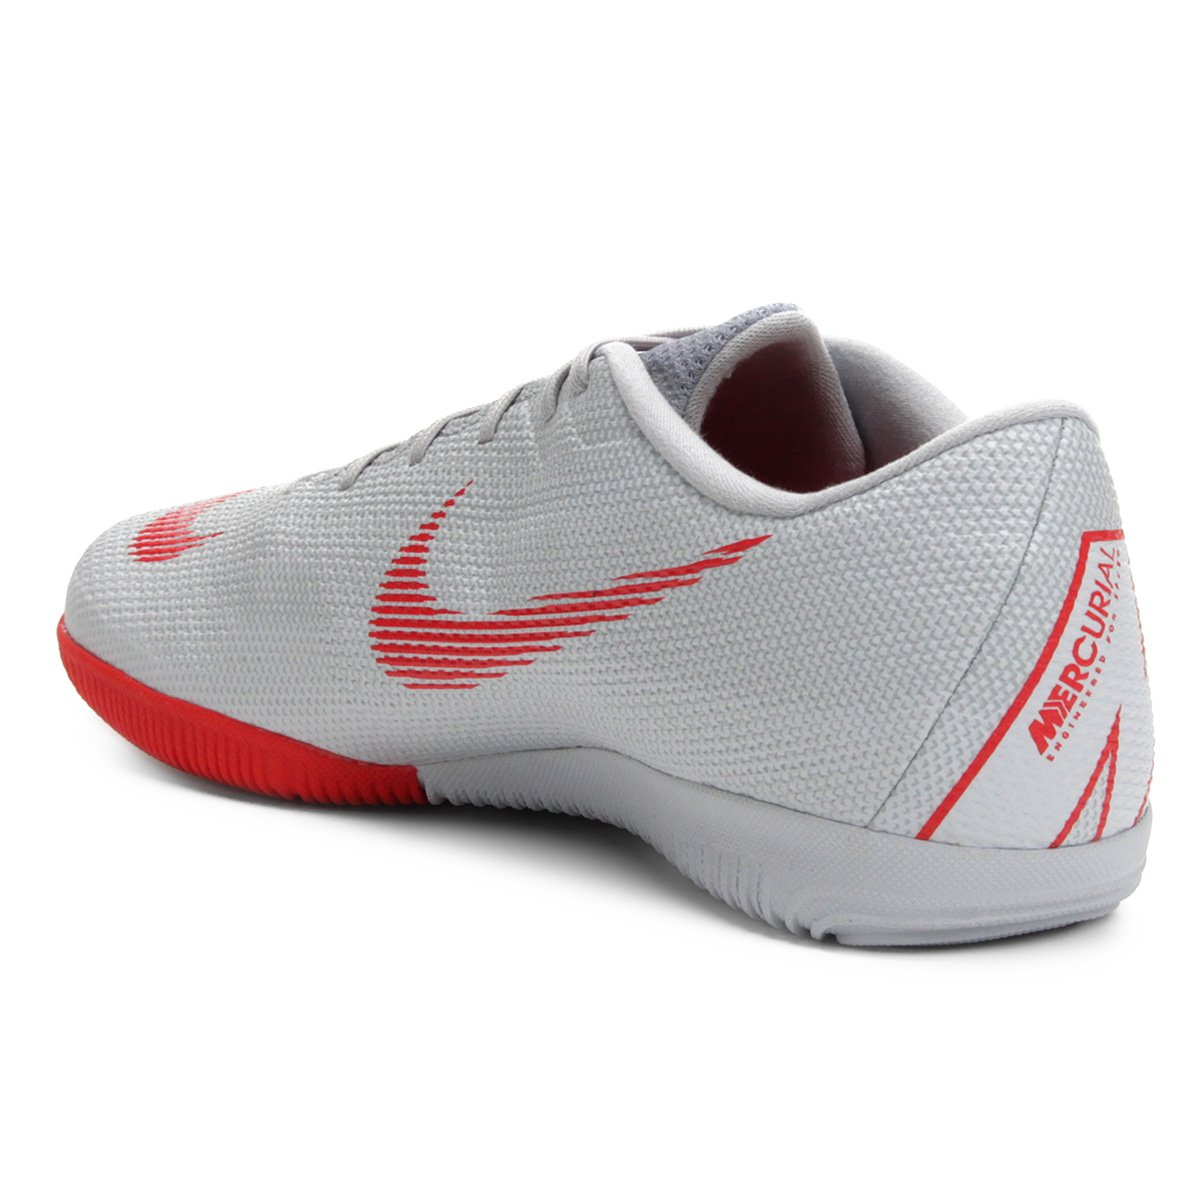 Chuteira Futsal Nike Mercurial Vapor 12 Academy - Cinza - Compre ... d7baed236ecdd